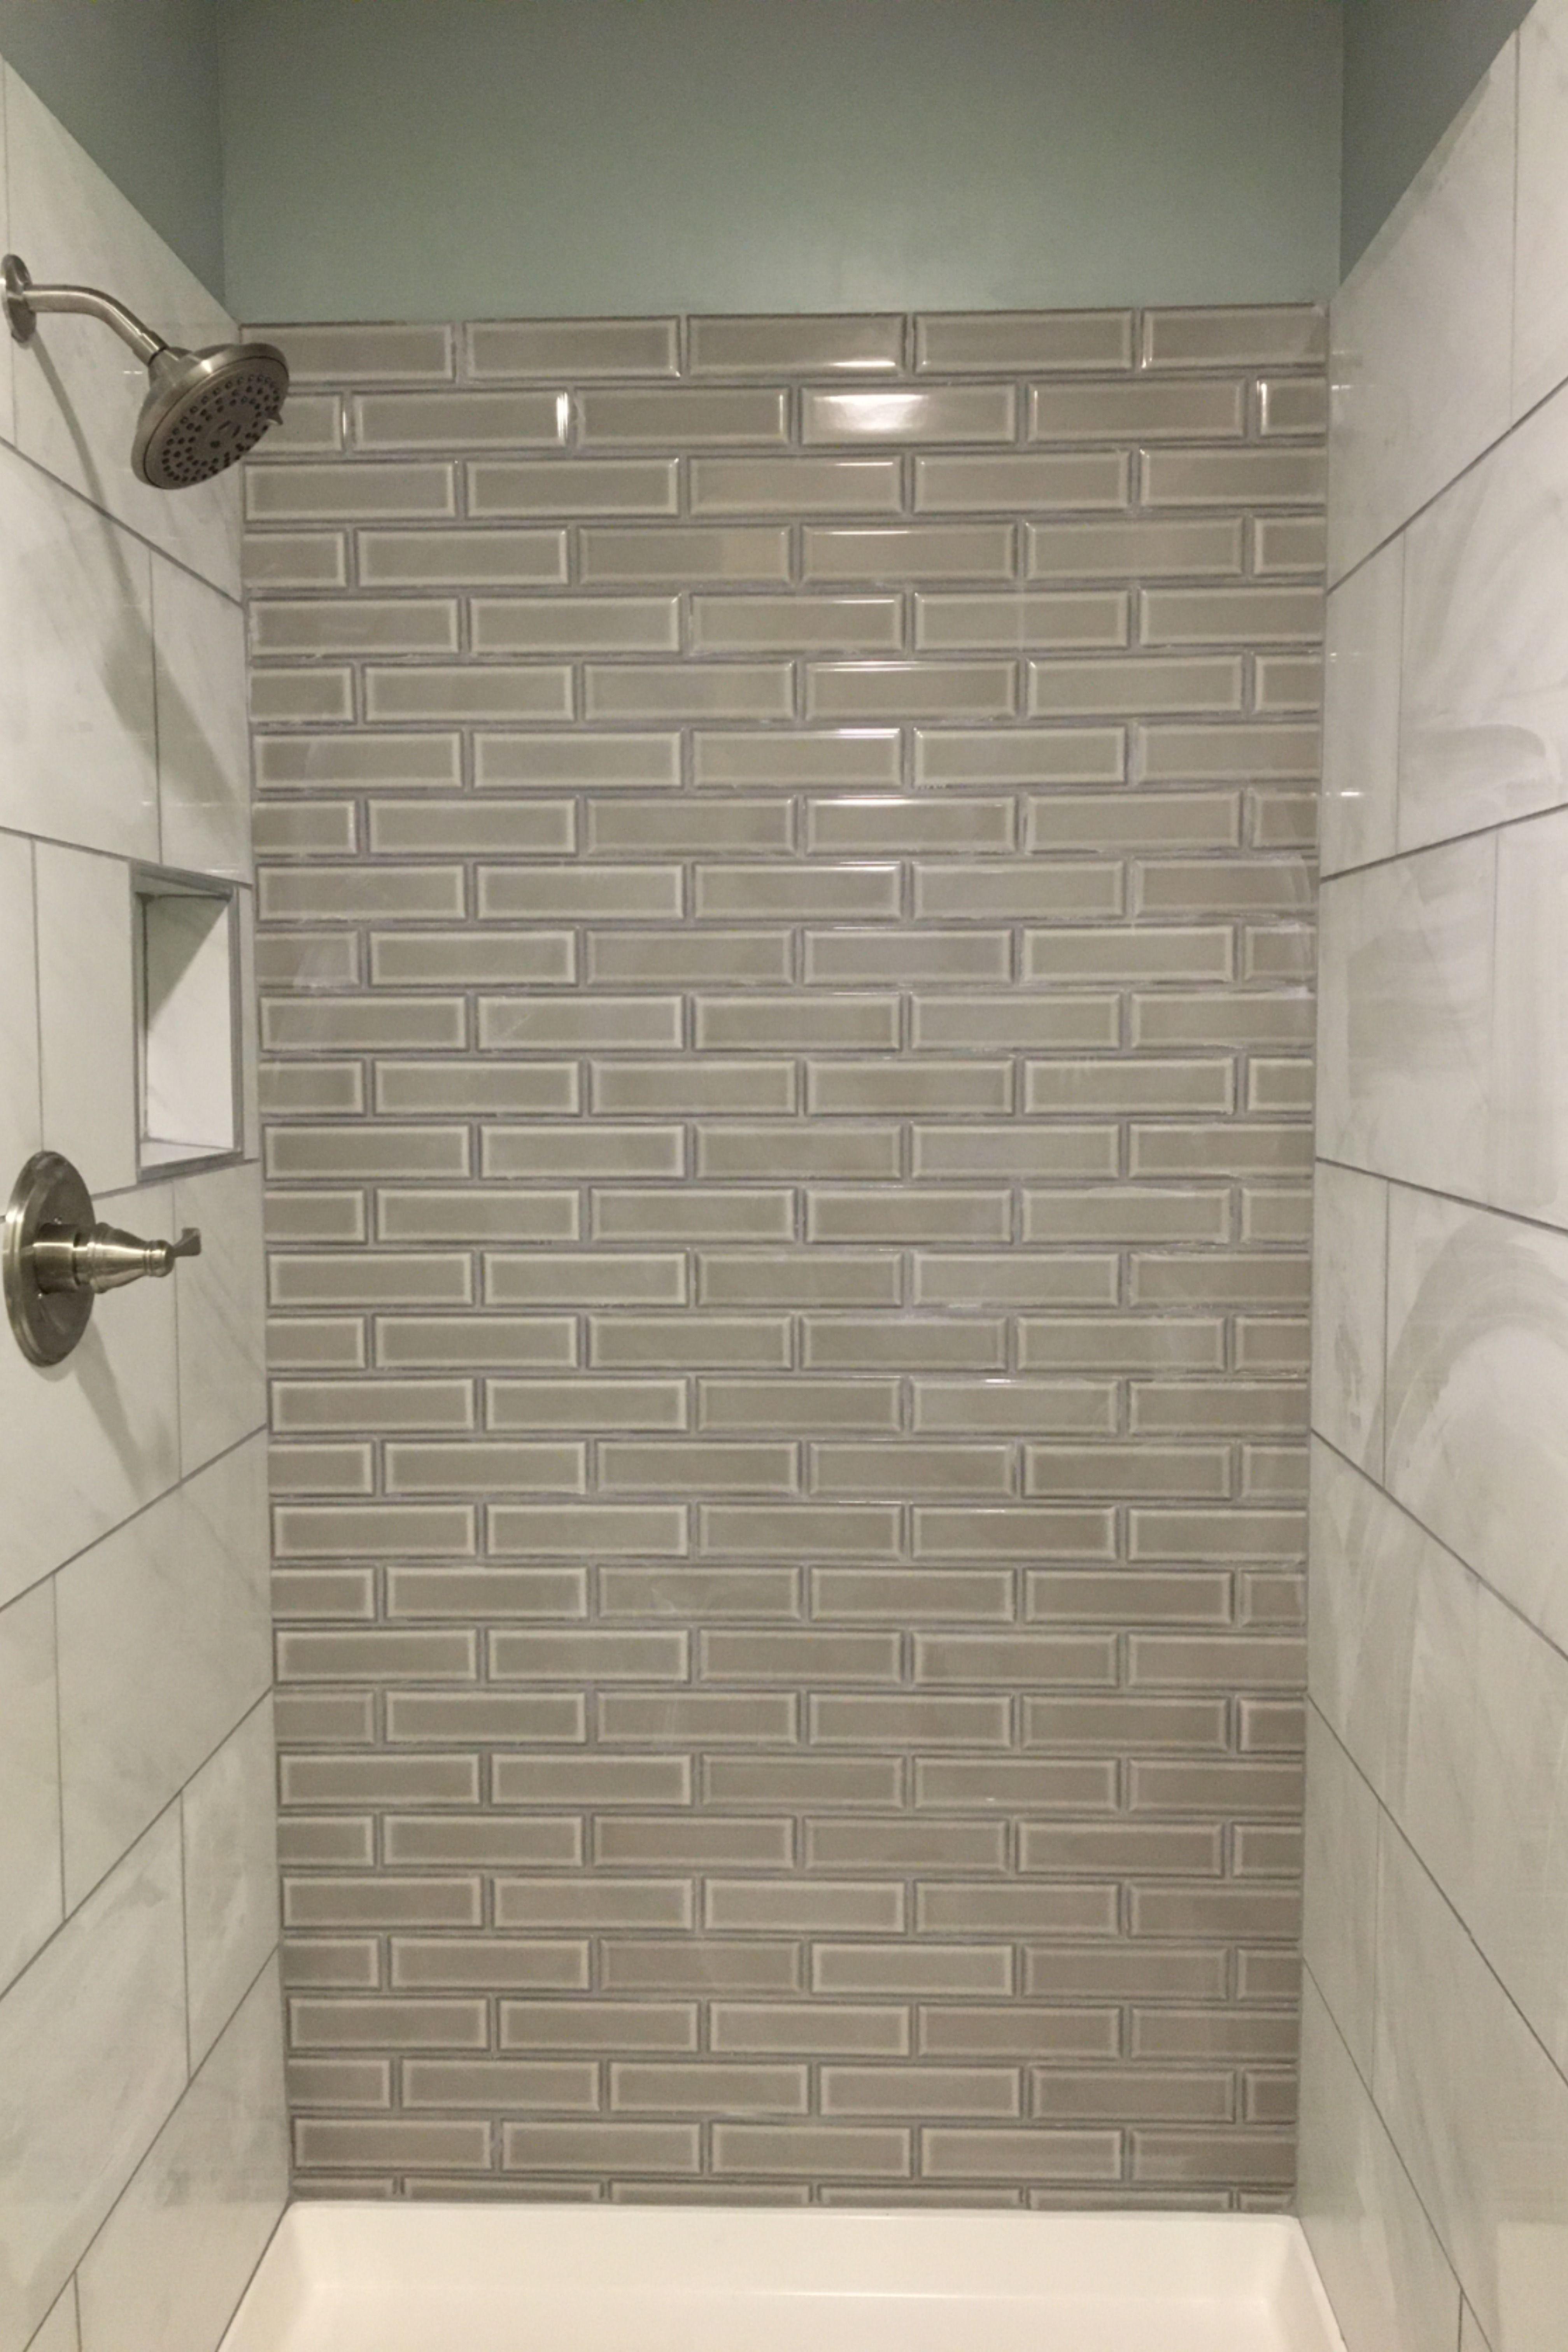 Mto0347 Modern 3x10 Subway Gray Glazed Ceramic Tile In 2020 Glazed Ceramic Tile Diy Tile Ceramic Tiles